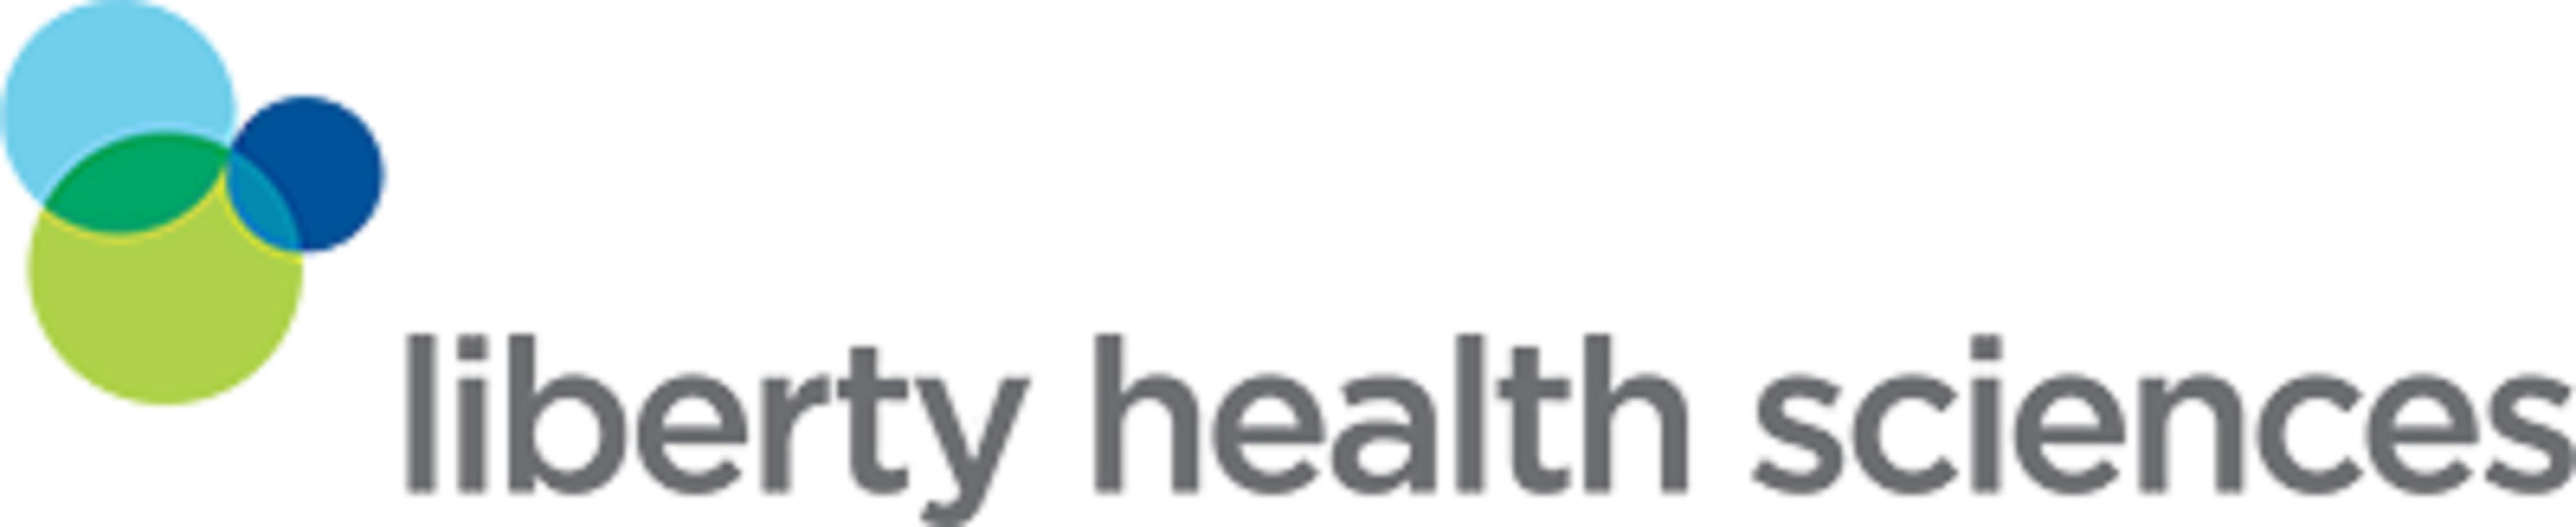 LHSIF logo